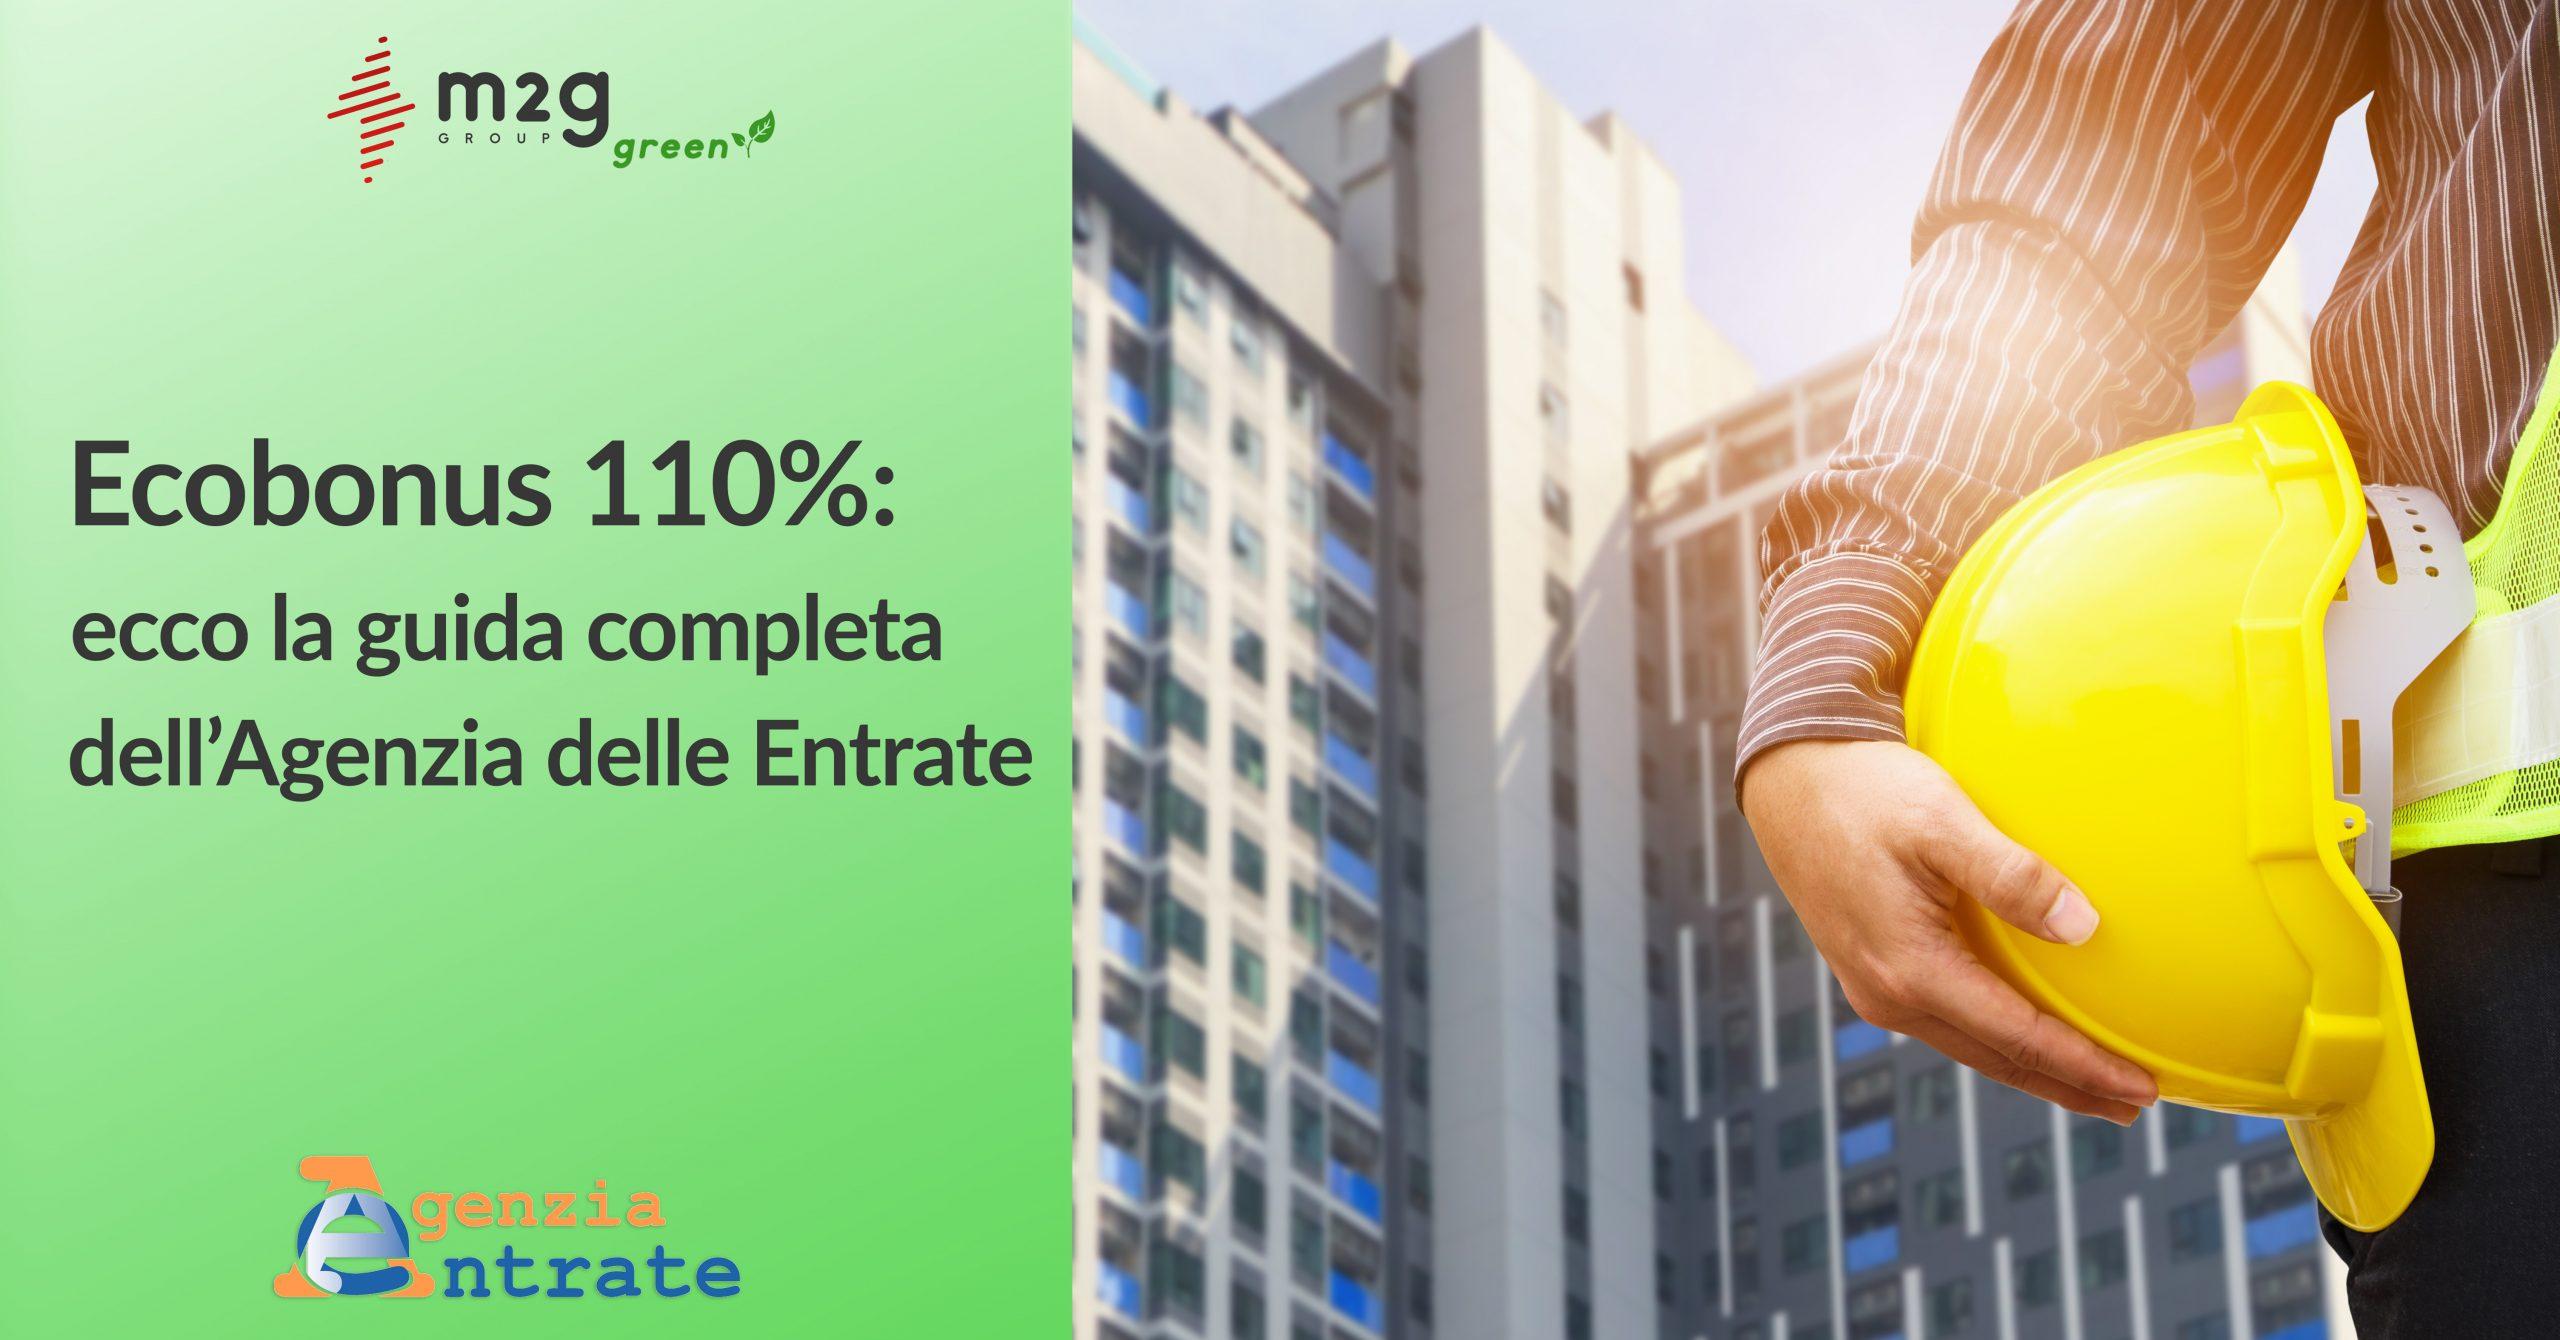 linee_guida_ecobonus_agenzia_delle_enetrate